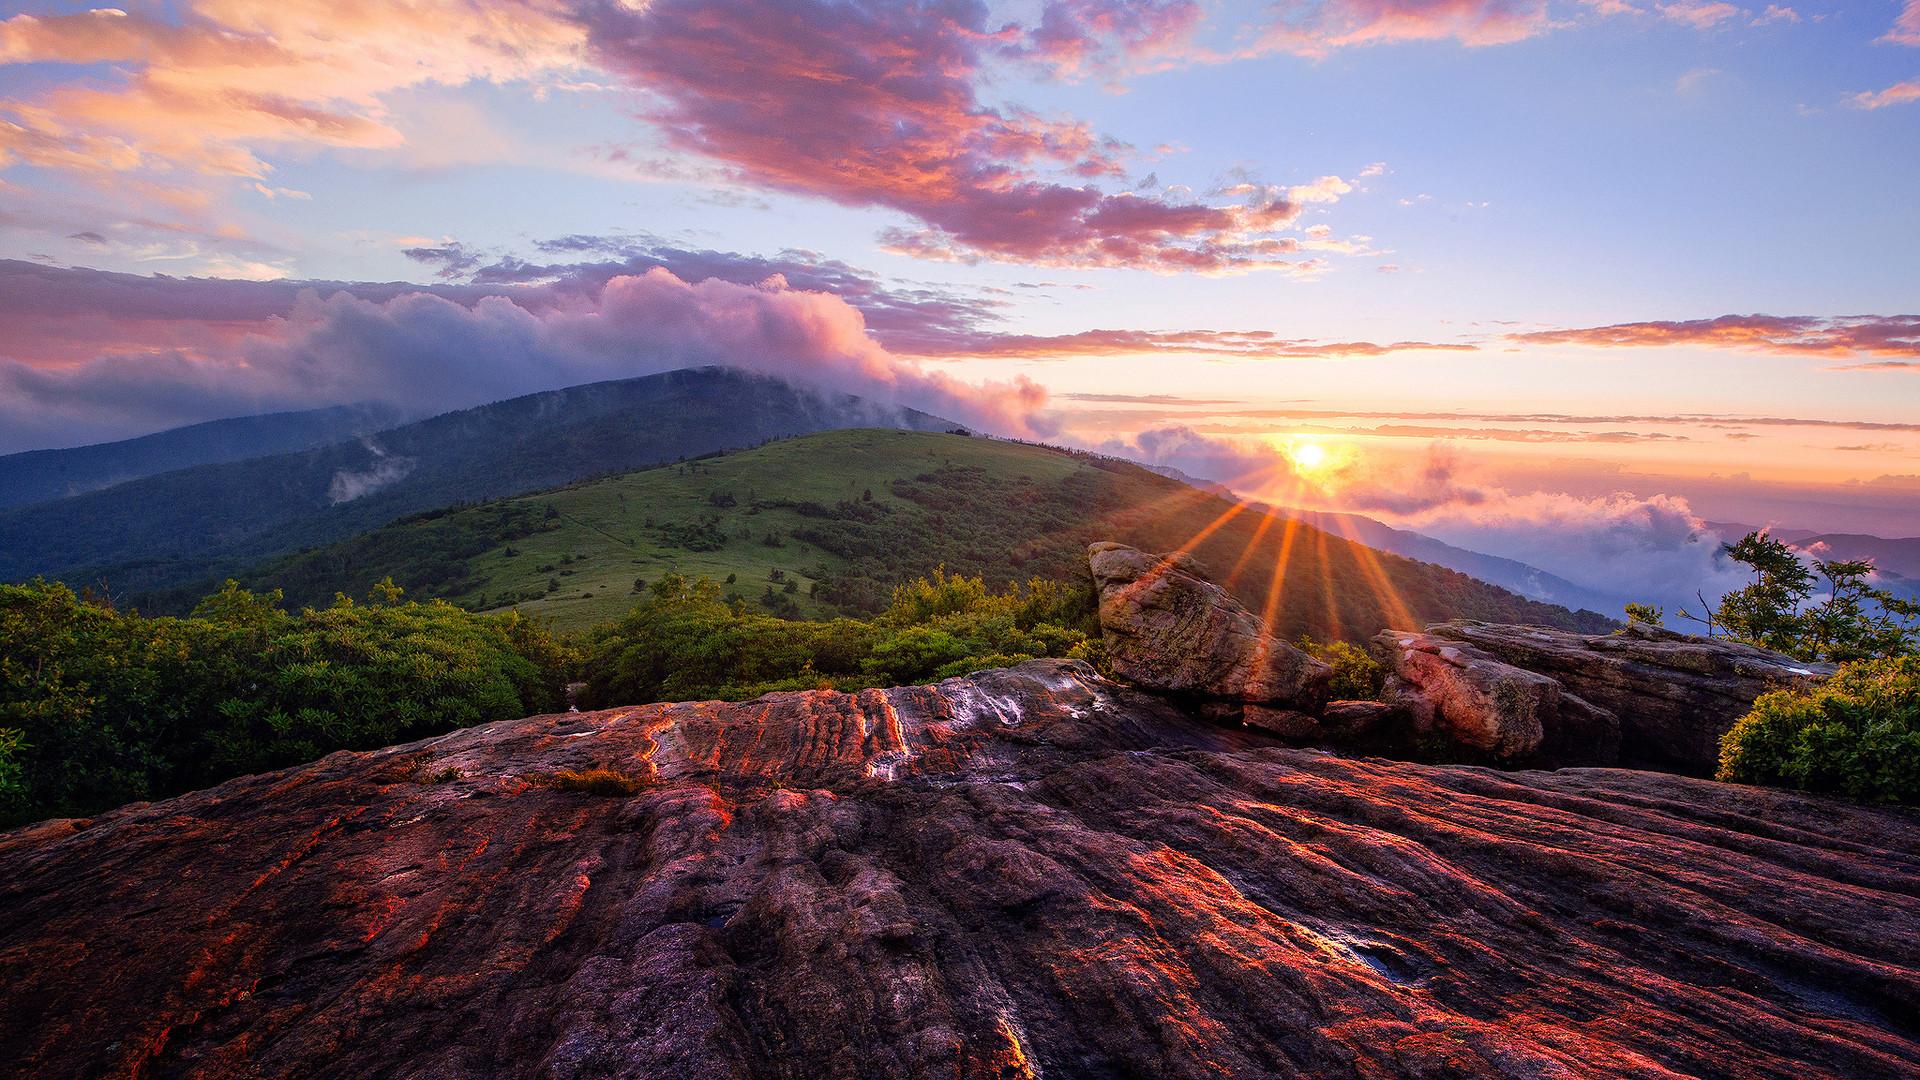 1920x1080 Beautiful Mountain Sunset Landscape Download